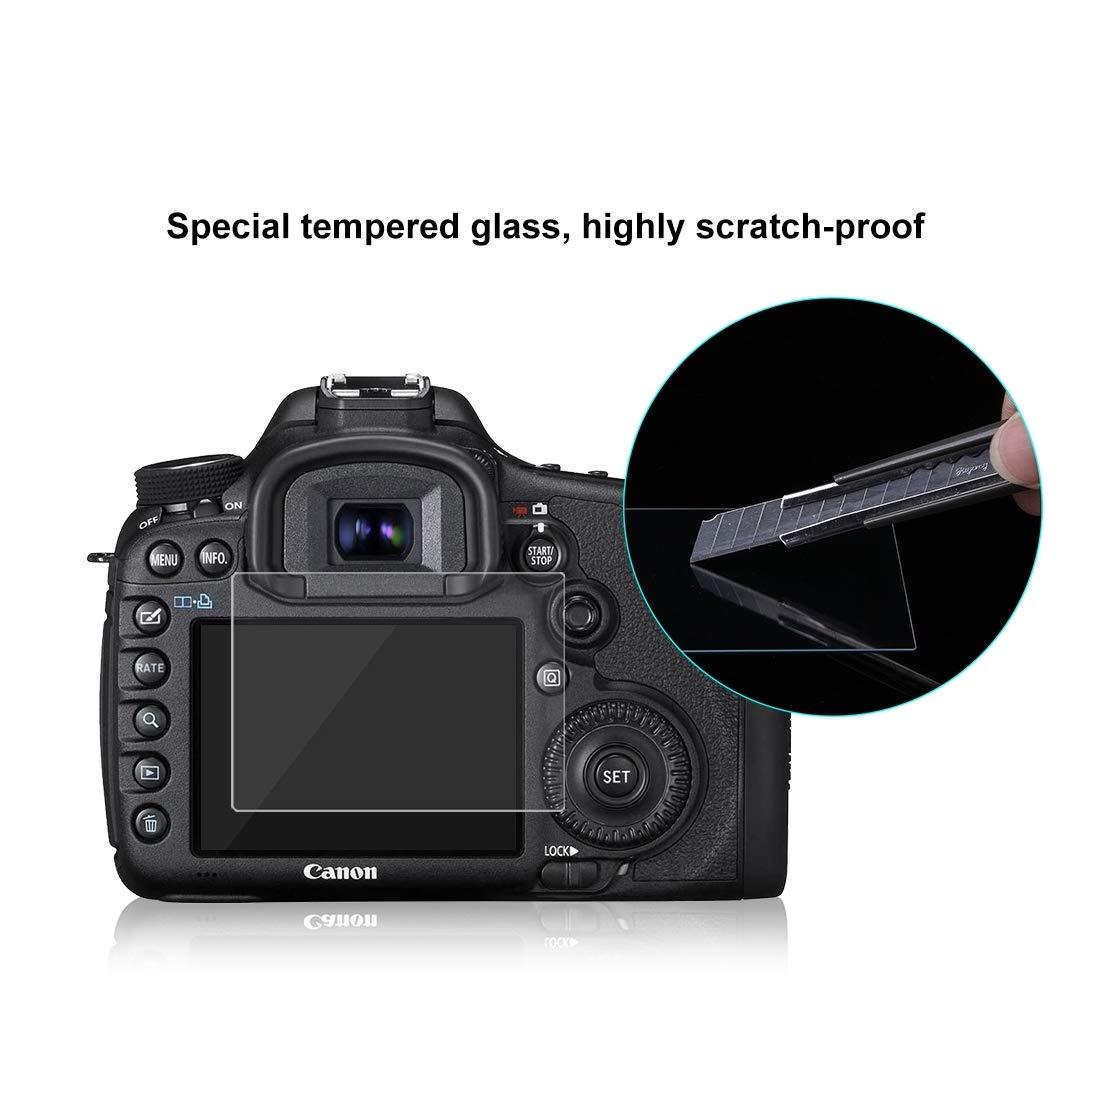 ShenBiadolr Screen Protector Foils 60 PCS PULUZ 2.5D Curved Edge 9H Surface Hardness Tempered Glass Screen Protector Kits for Canon 5D Mark IV Mark III Sony RX100 A7M2 A7R A7R2 Nikon D3200 D3300 Panas